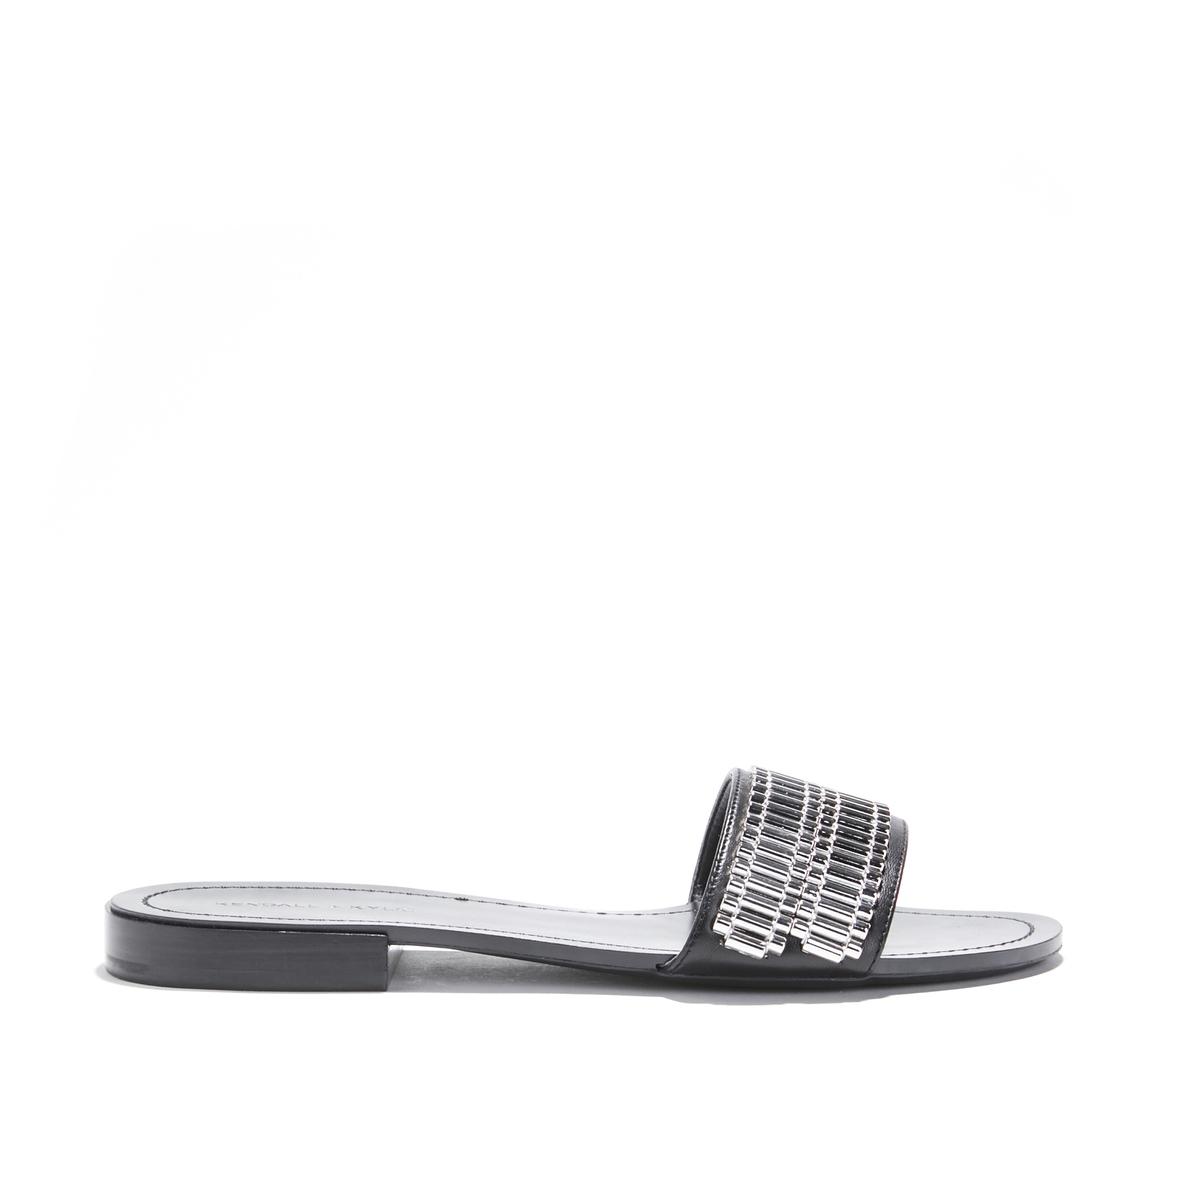 Туфли без задника с ремешками в виде цепочки на плоском каблуке KKENNEDY